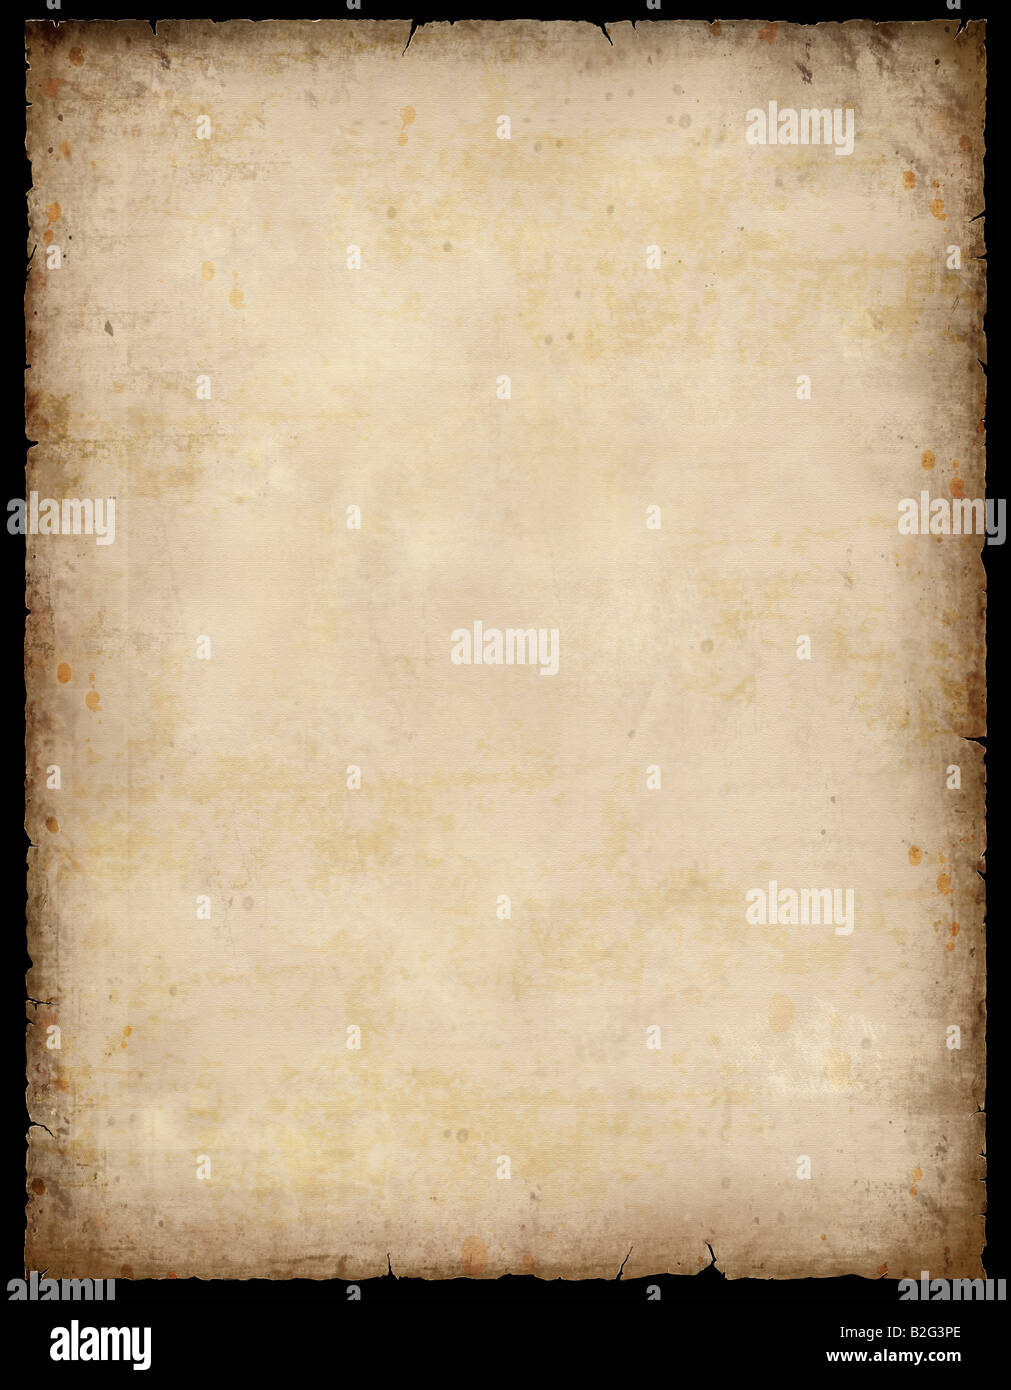 Vintage Paper Background - Stock Image